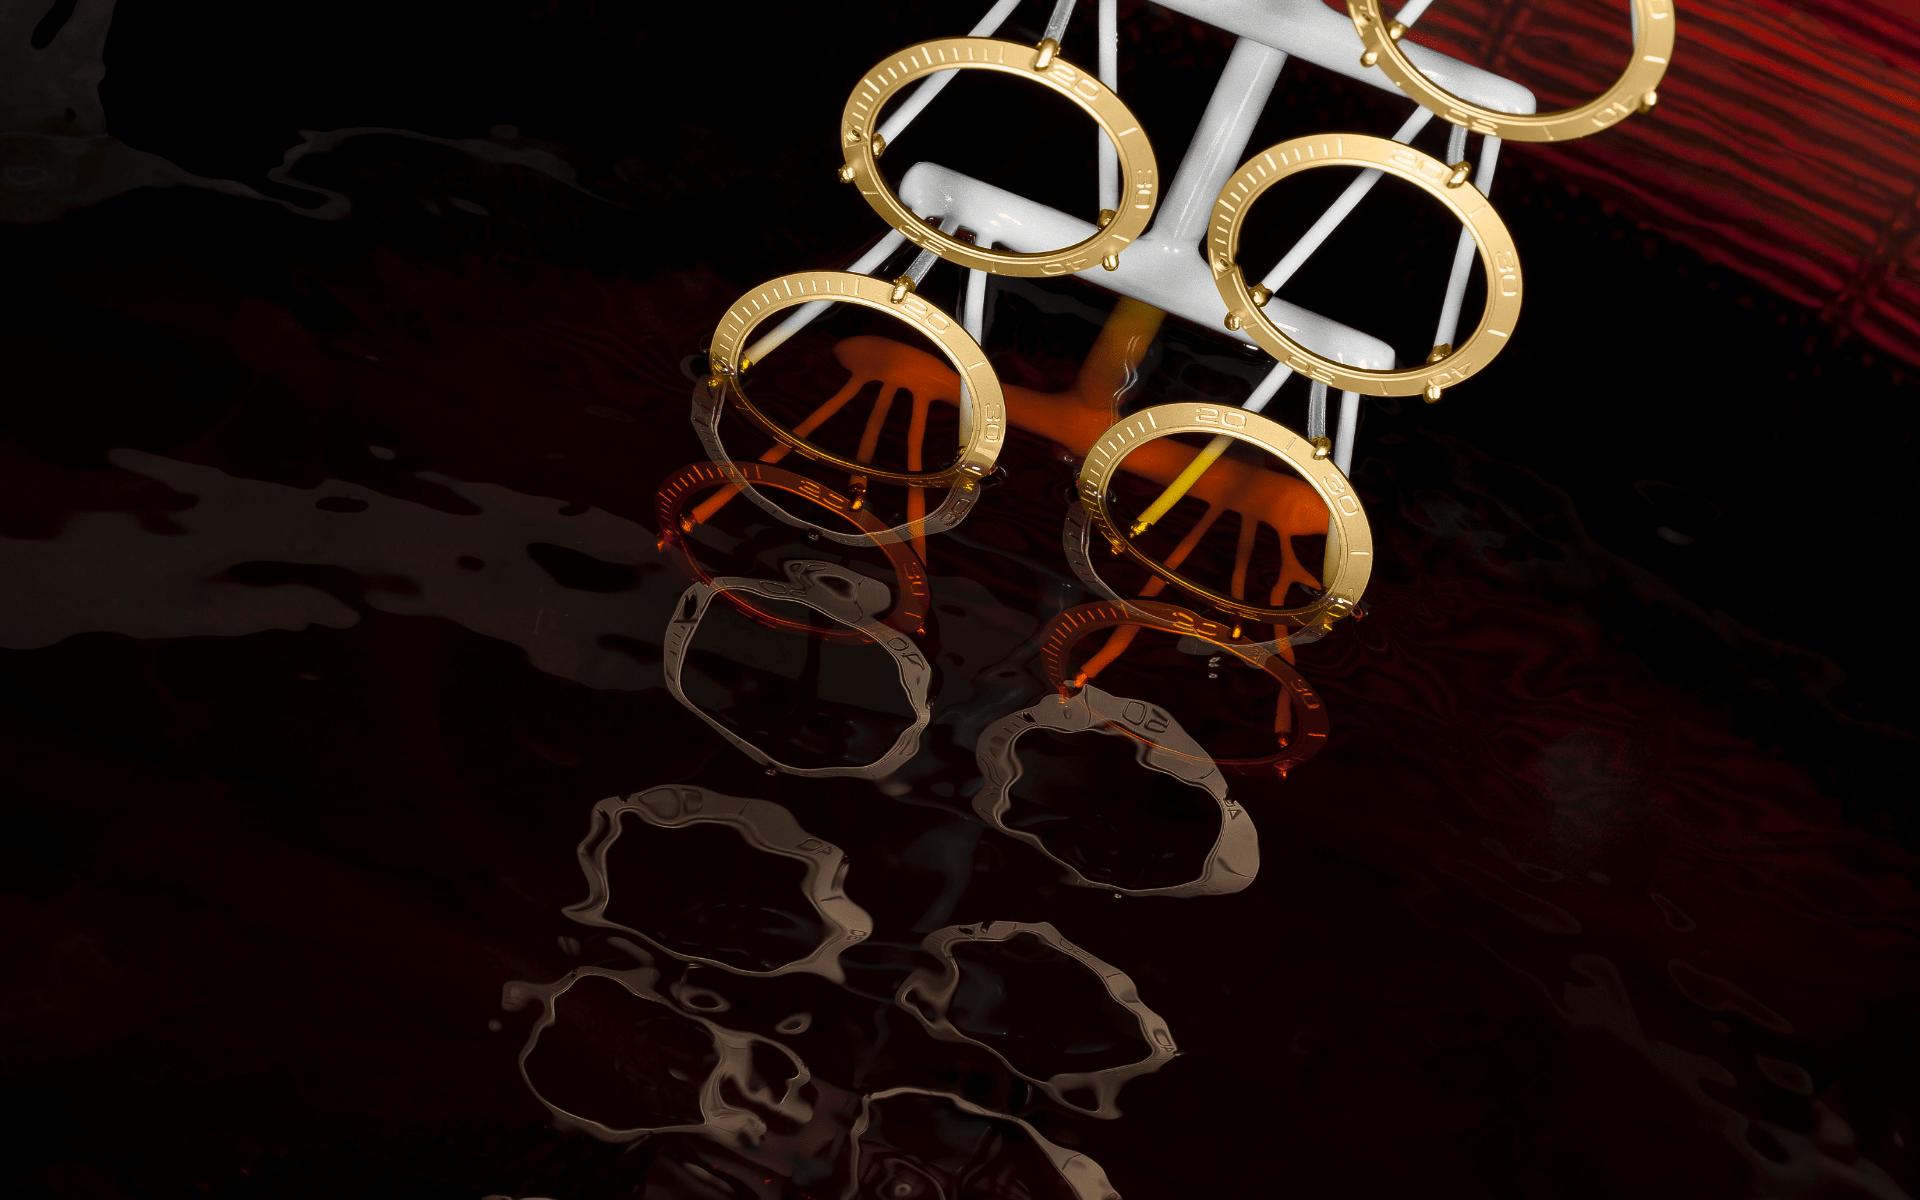 Ceramic rings dipped in gold bath (Photo: Omega)